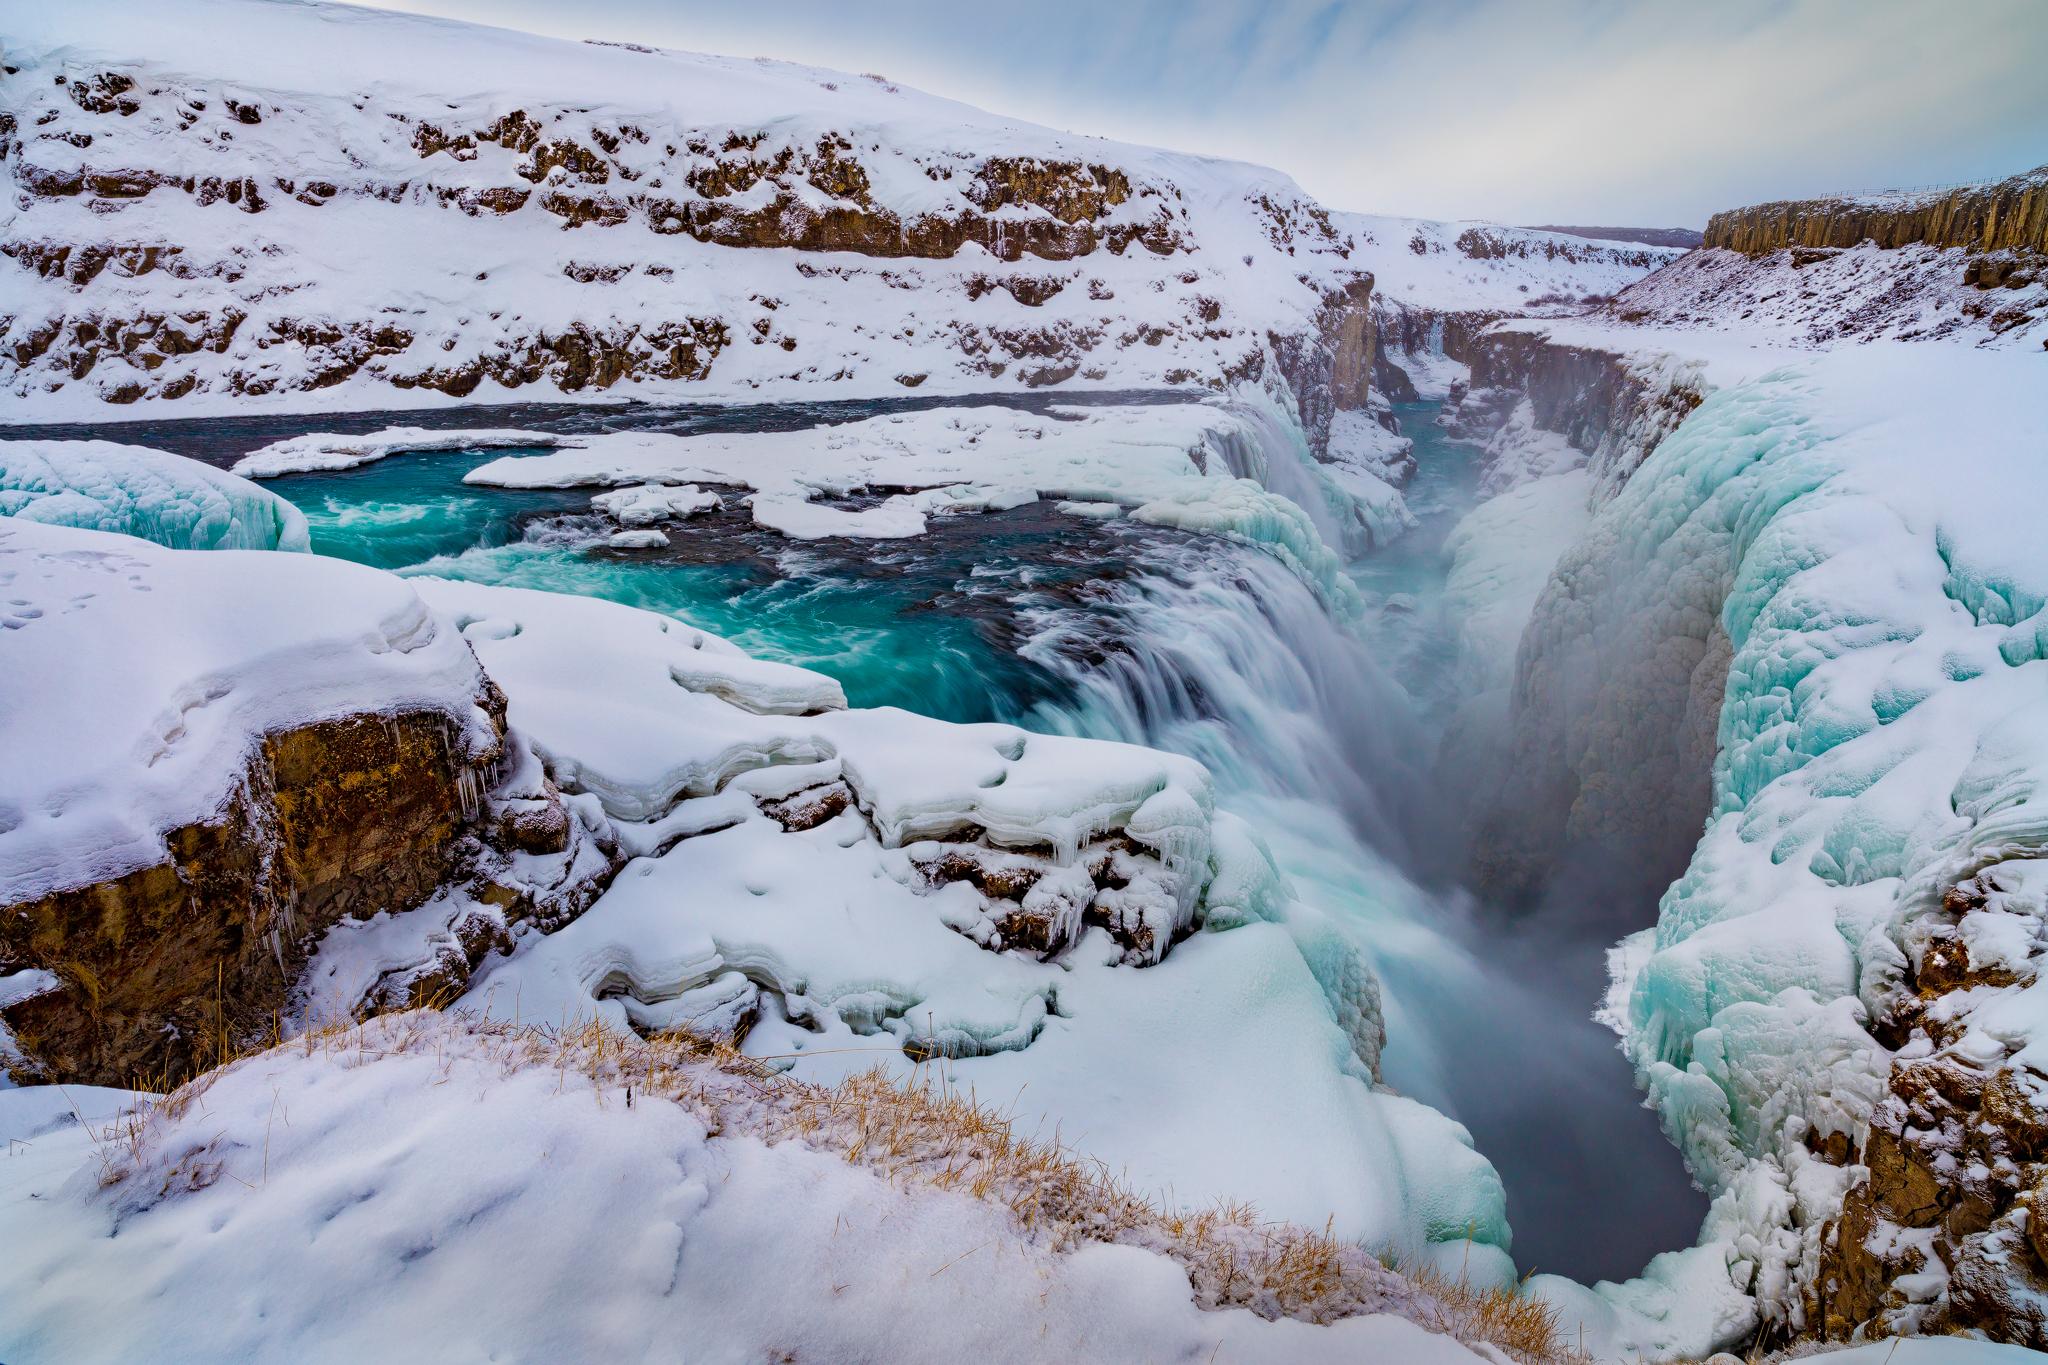 20160305-Iceland-Ken-Kaminesky-C-0317.jpg